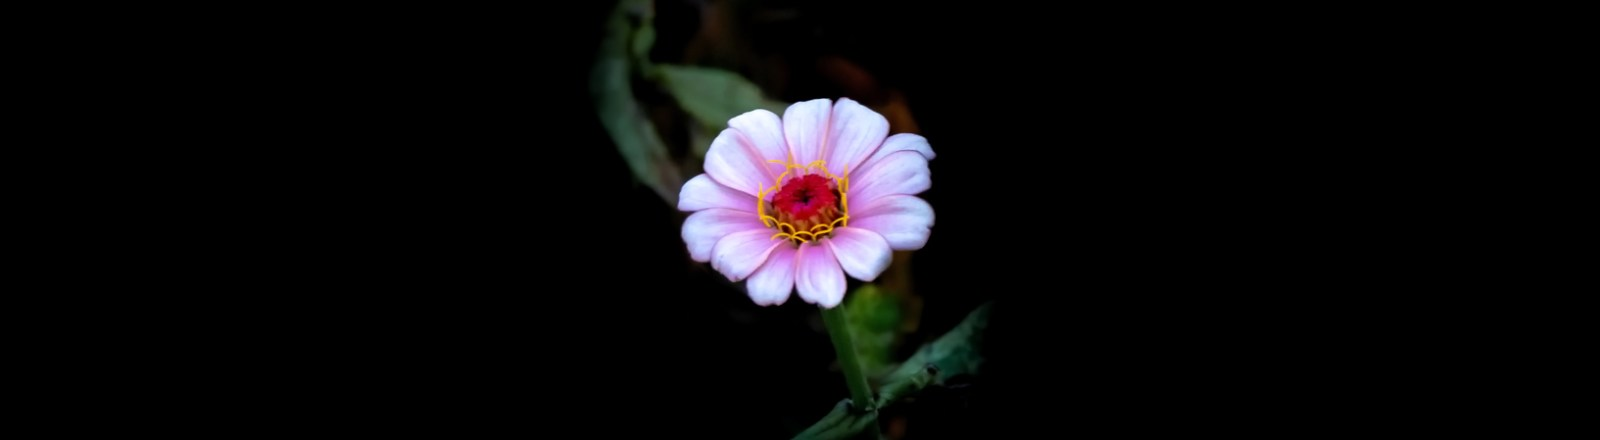 Ten Wildflowers and Three Butterflies